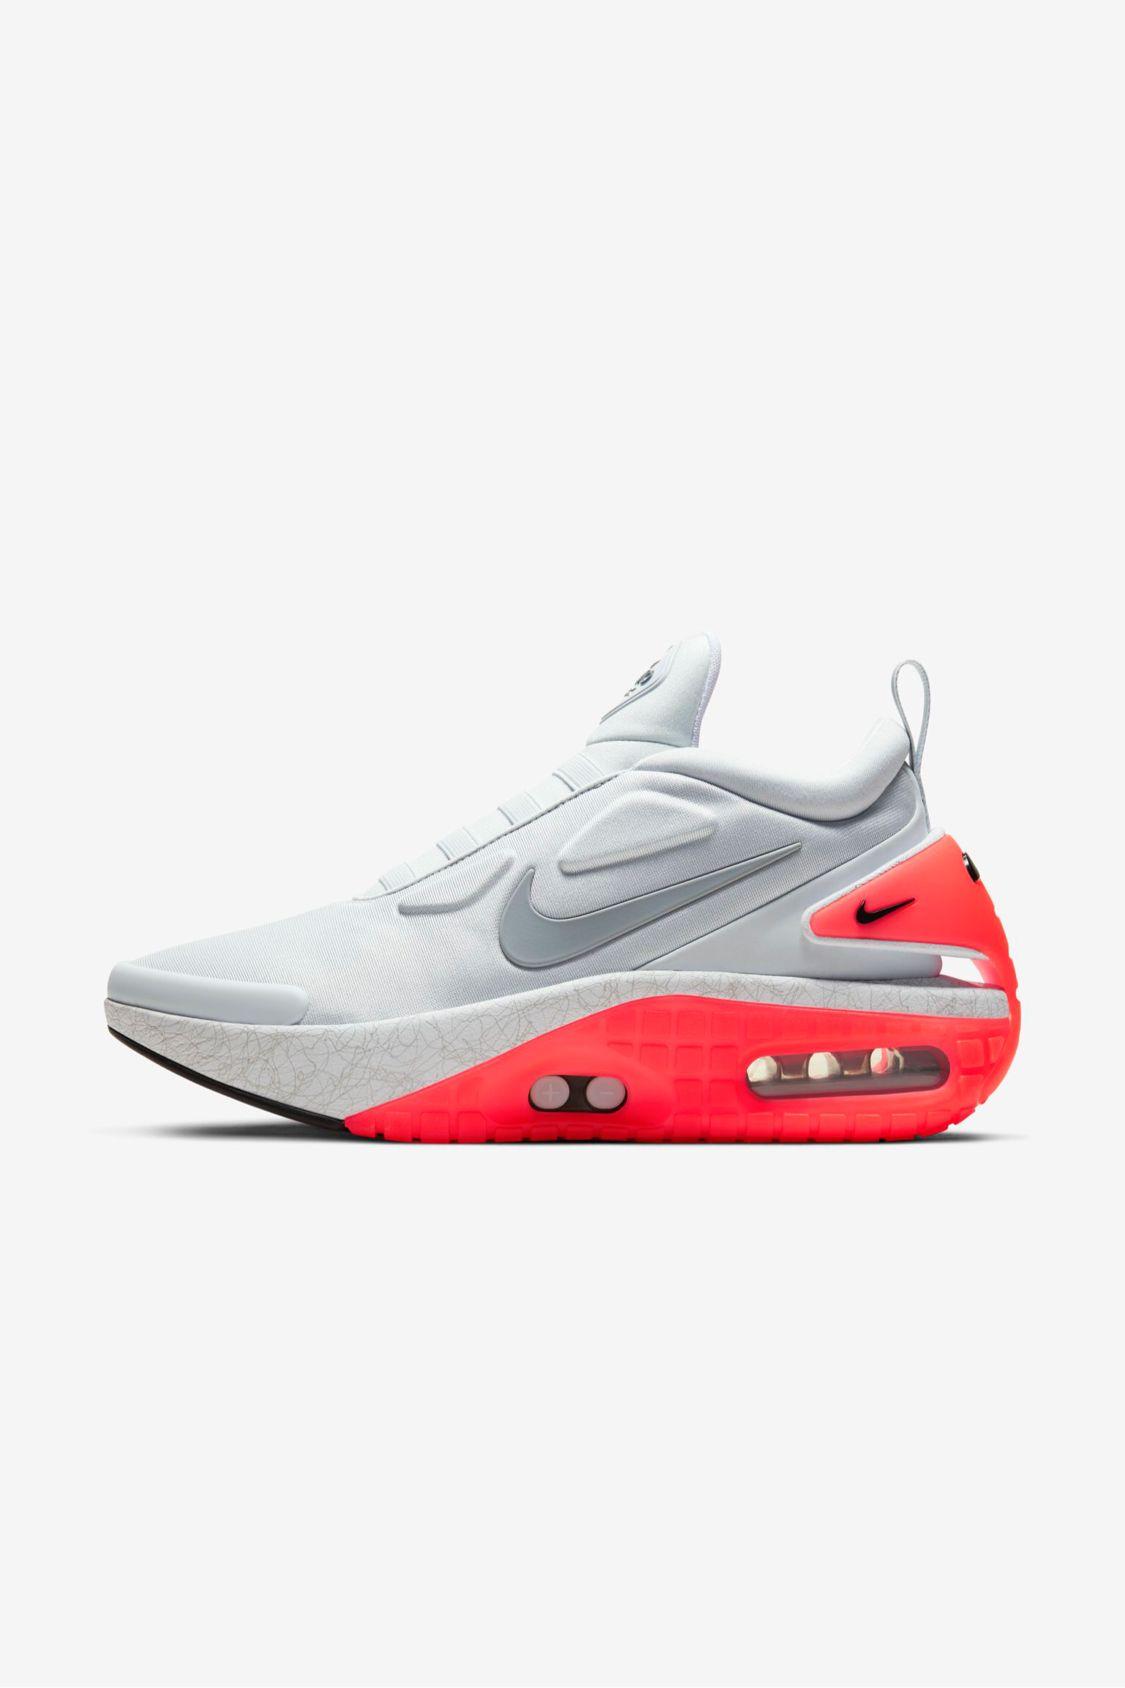 vestirse Marcado Atrevimiento  Via Nike SNEAKRS: https://www.nike.com/gb/launch /t/adapt-auto-max-pure-platinum-uk?sitesrc=sneakrsIosShare in 2020 |  Sneakers men fashion, Nike snkrs, Sneakers